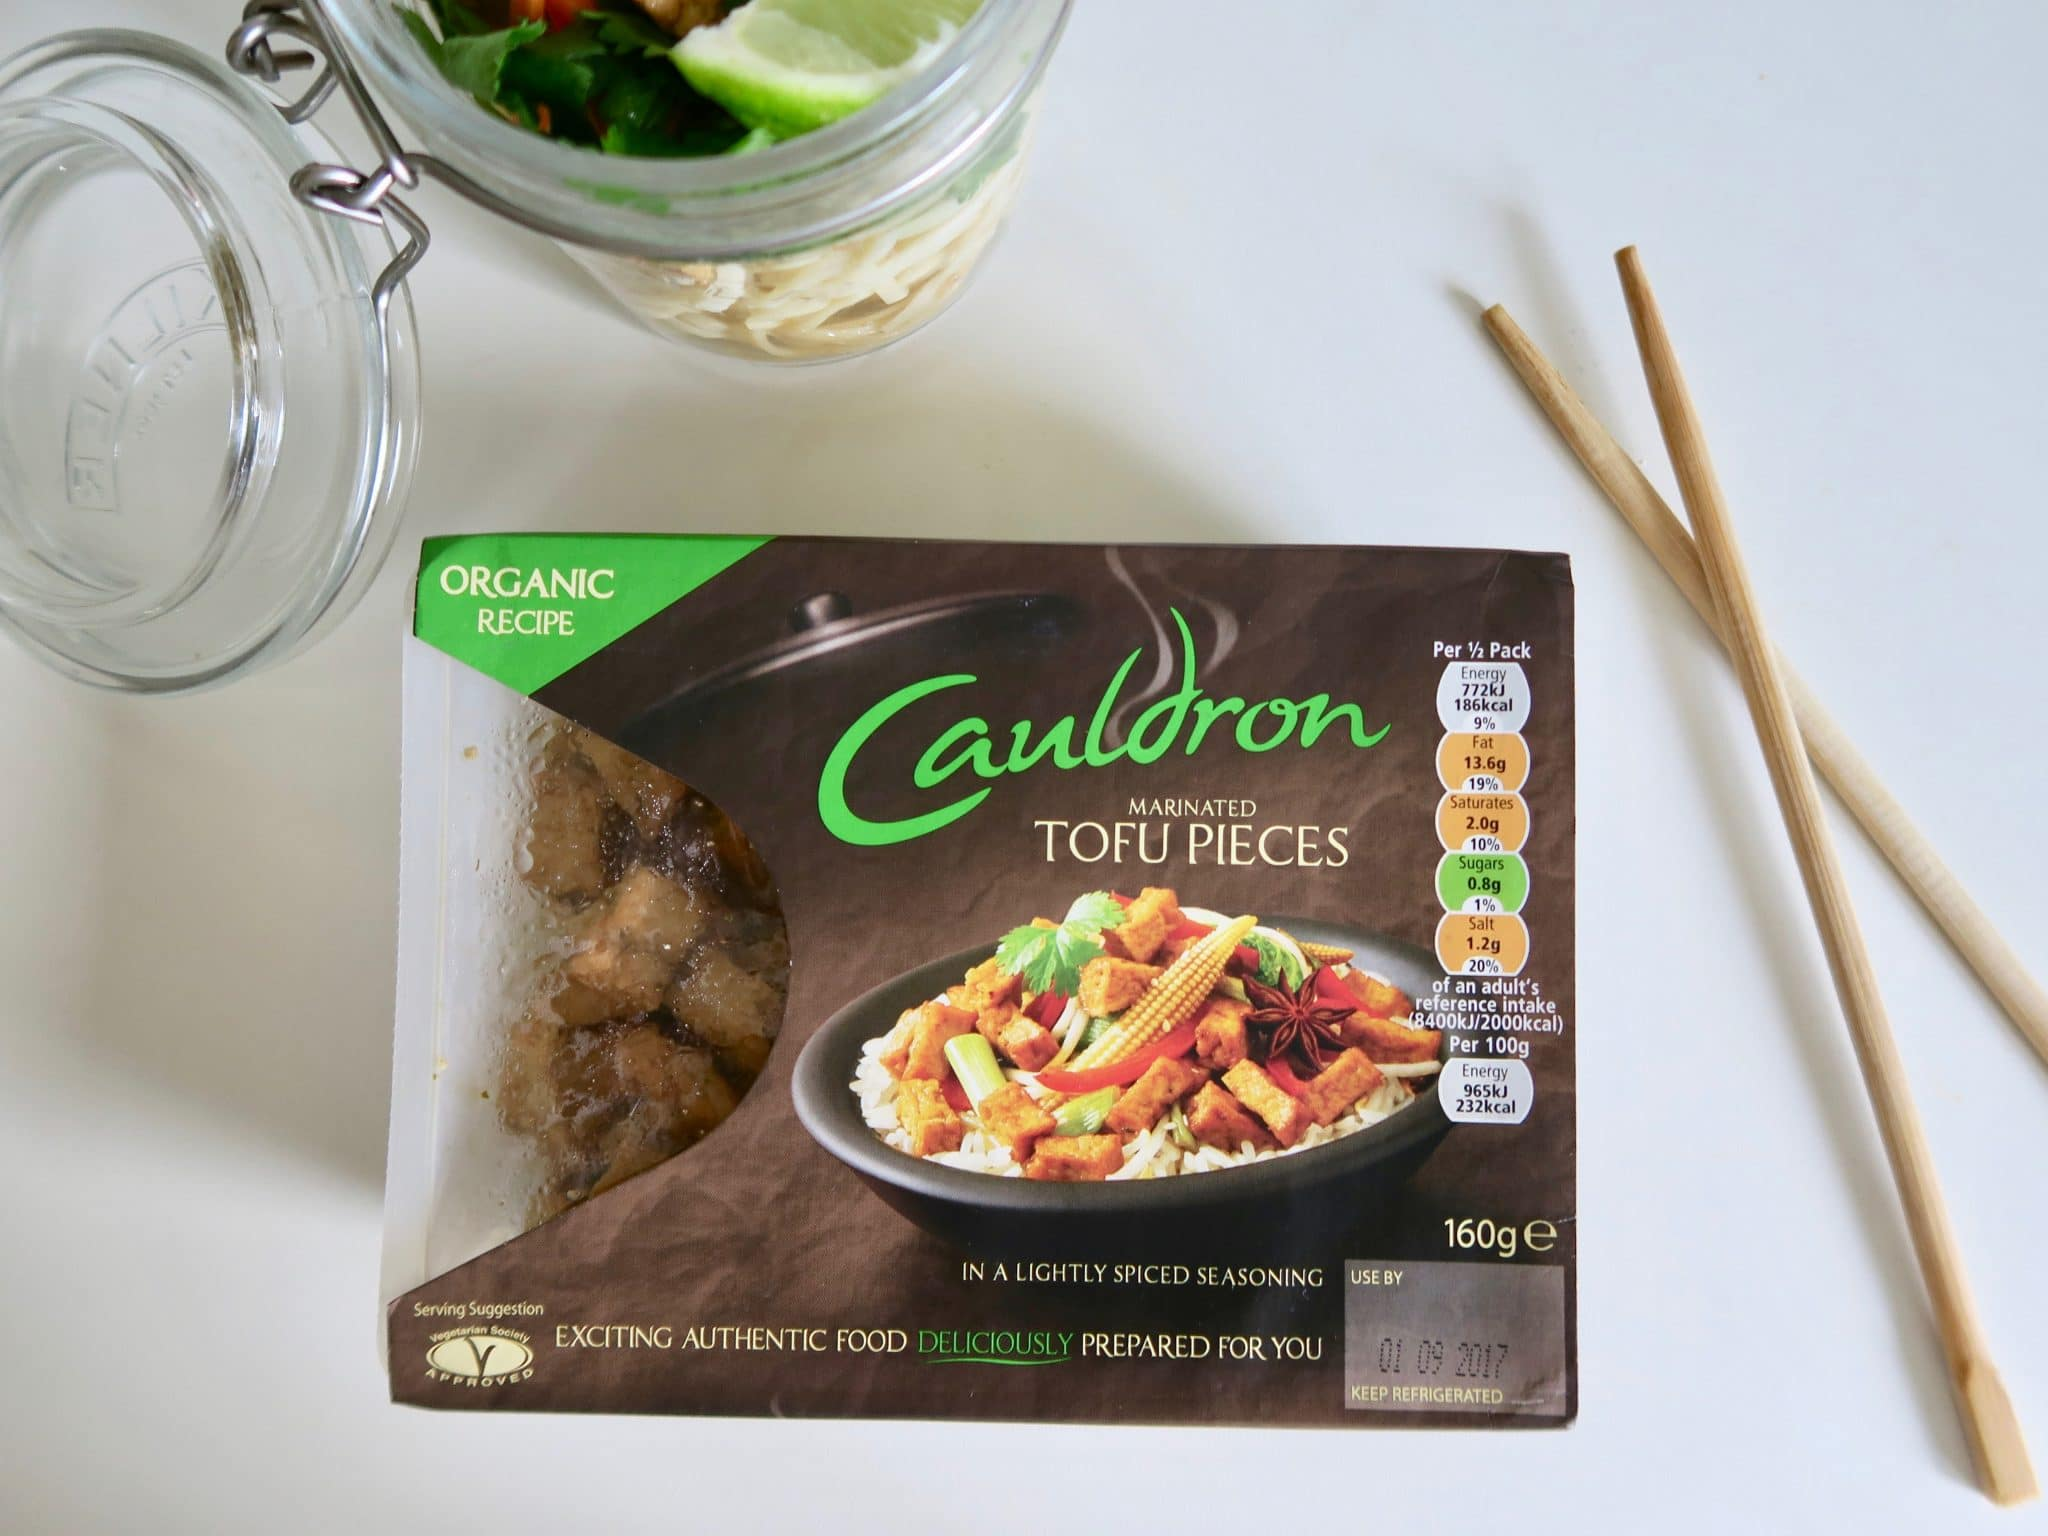 Cauldron Foods Organic Marinated Tofu Pieces